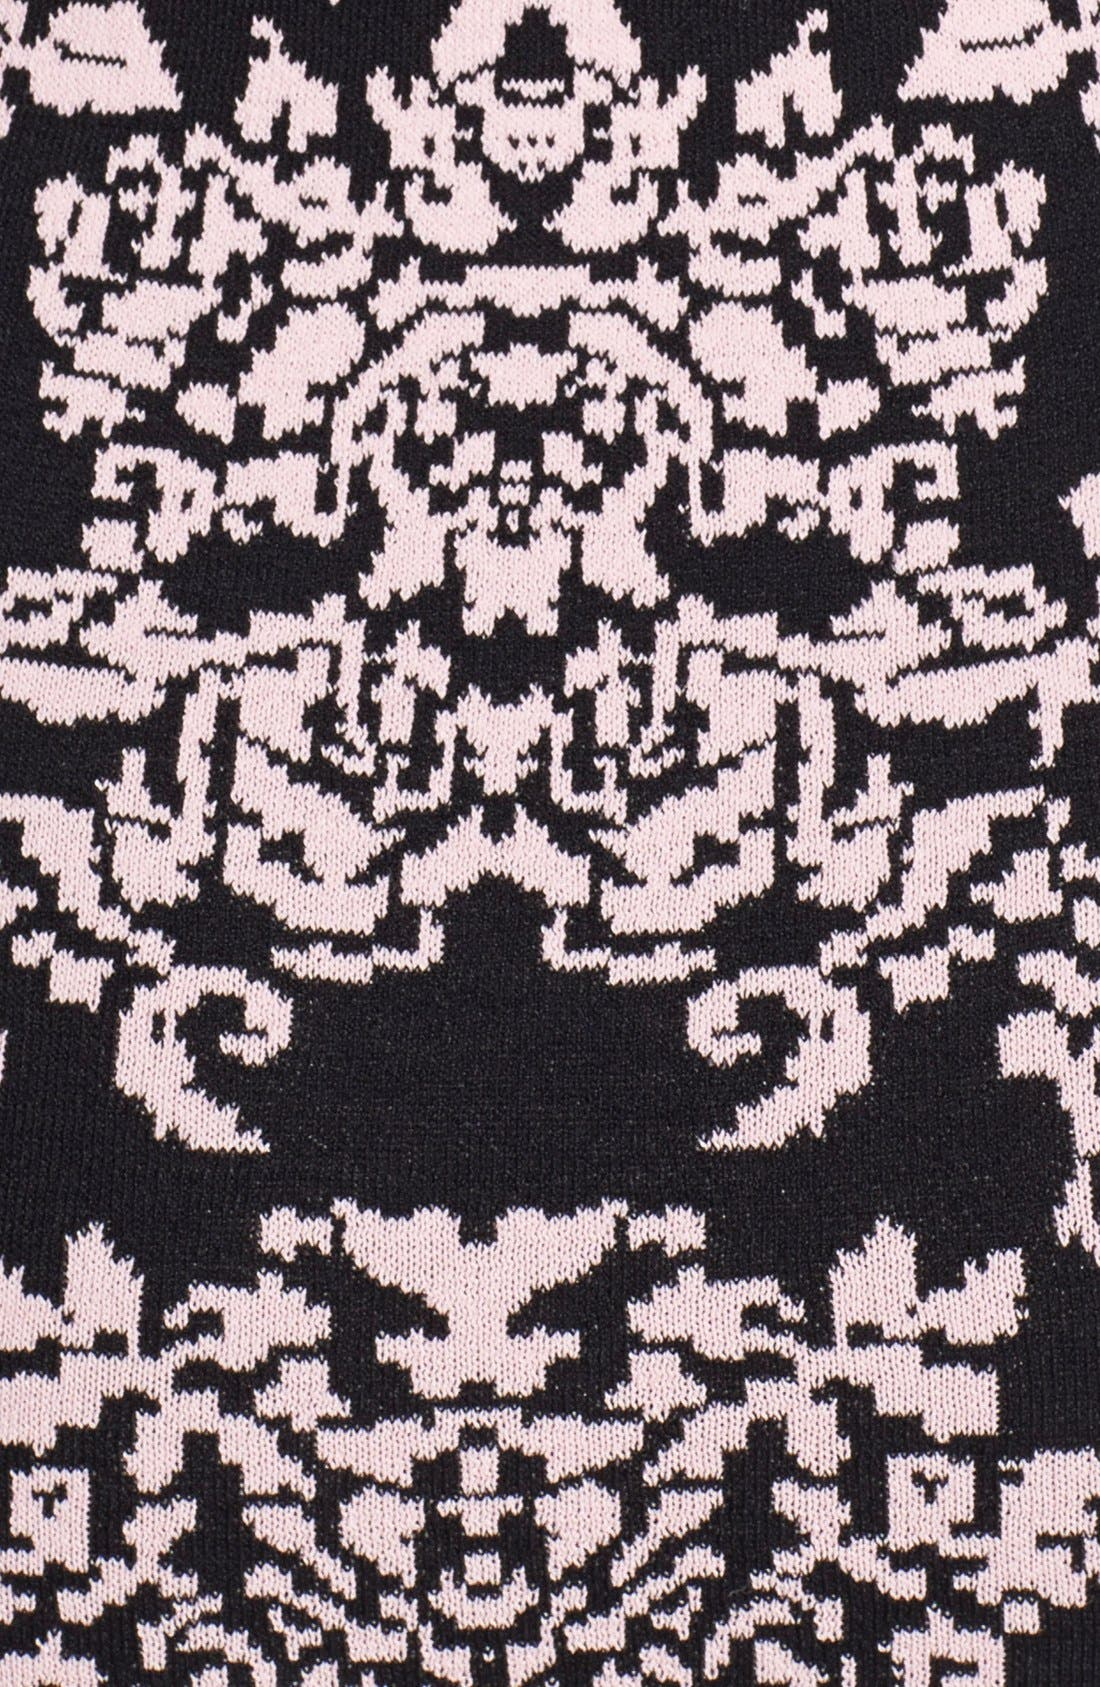 Jacquard Knit Body-Con Dress,                             Alternate thumbnail 3, color,                             650